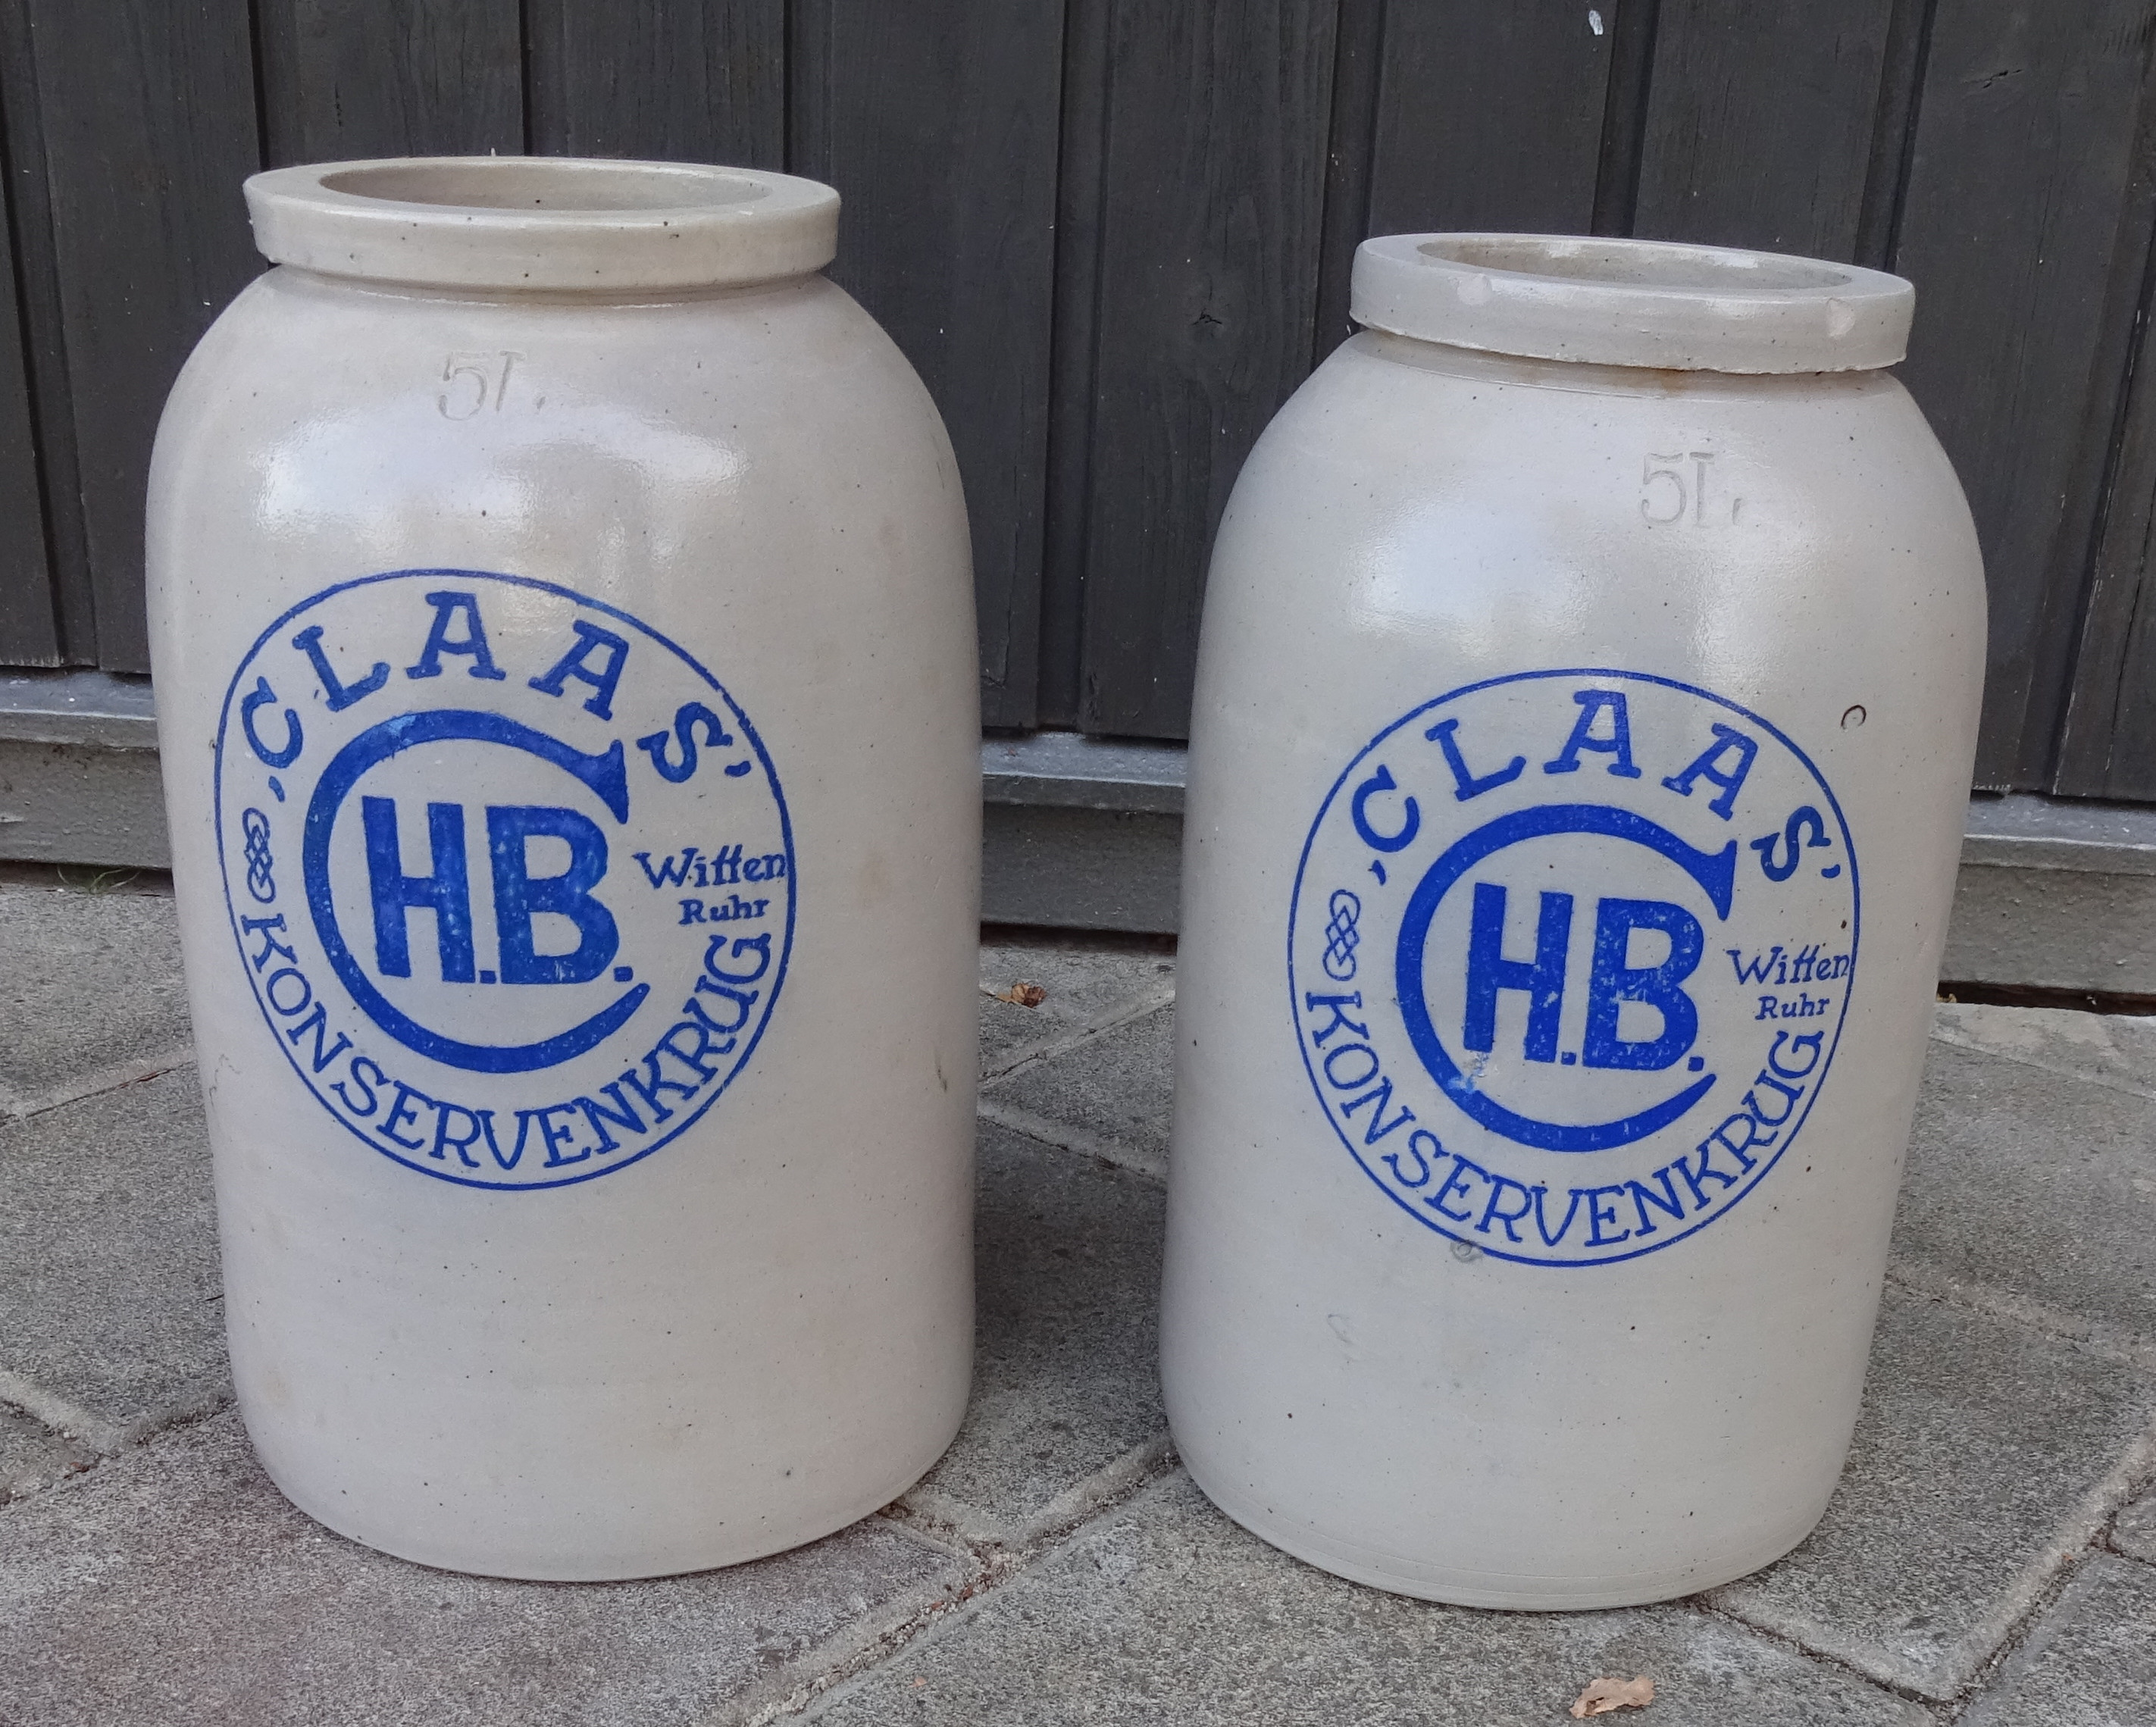 Konservenkrug Keramik 5 L Claas HB Witten Ruhr- Rarität